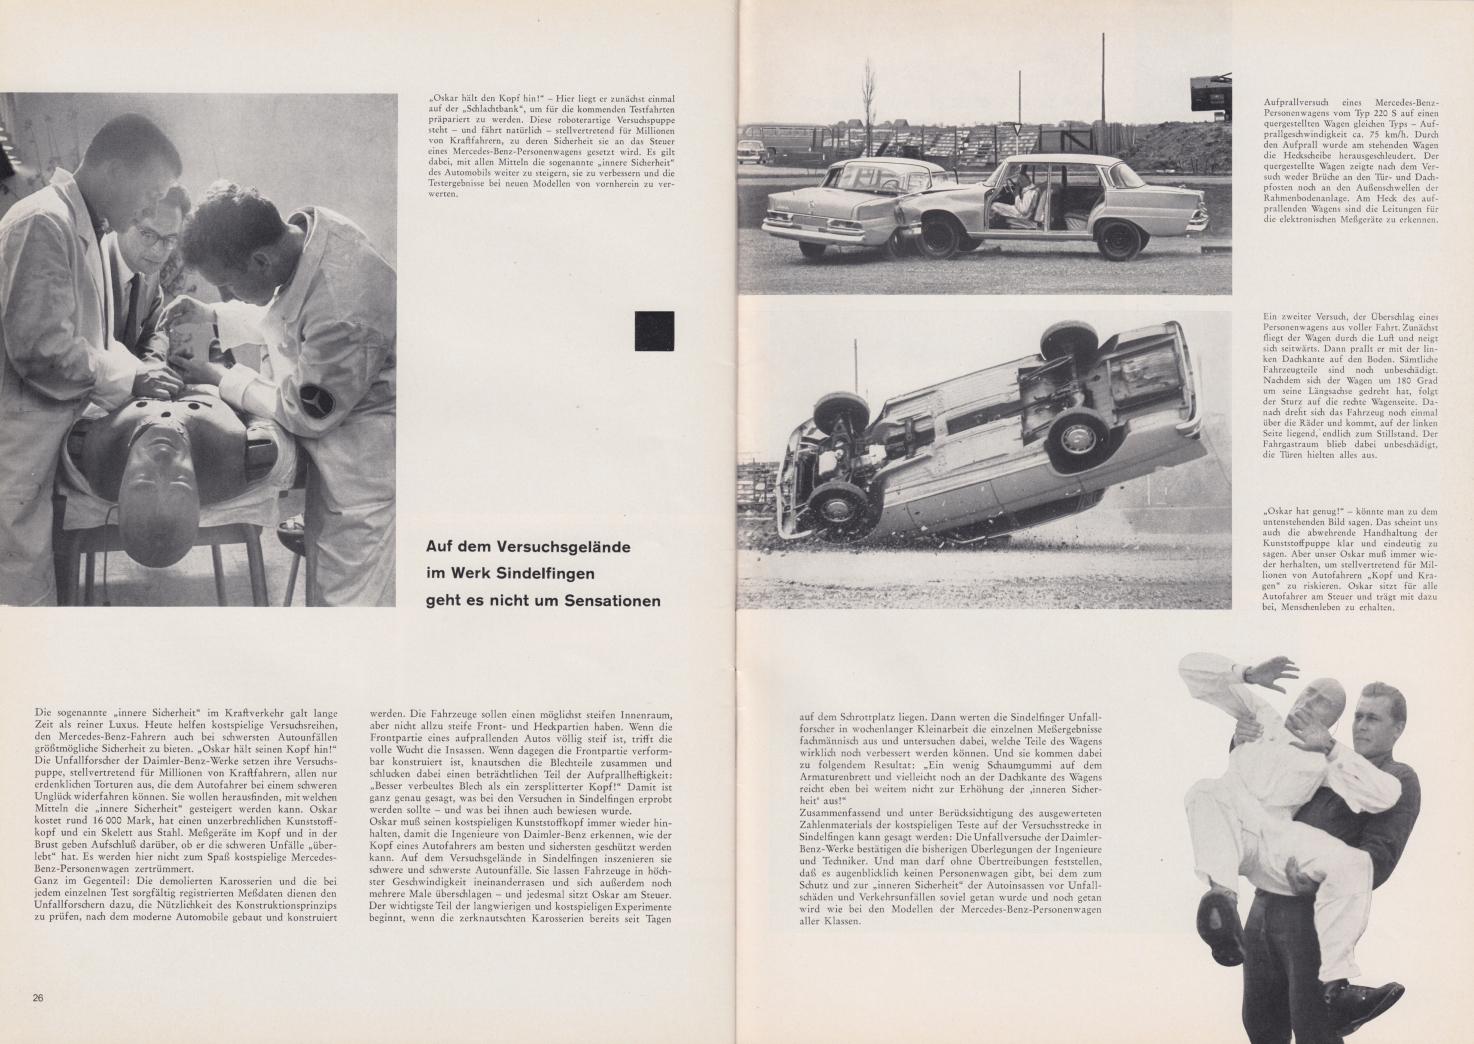 (REVISTA): Periódico In aller welt n.º 44 - Mercedes-Benz no mundo - 1960 - multilingue 014